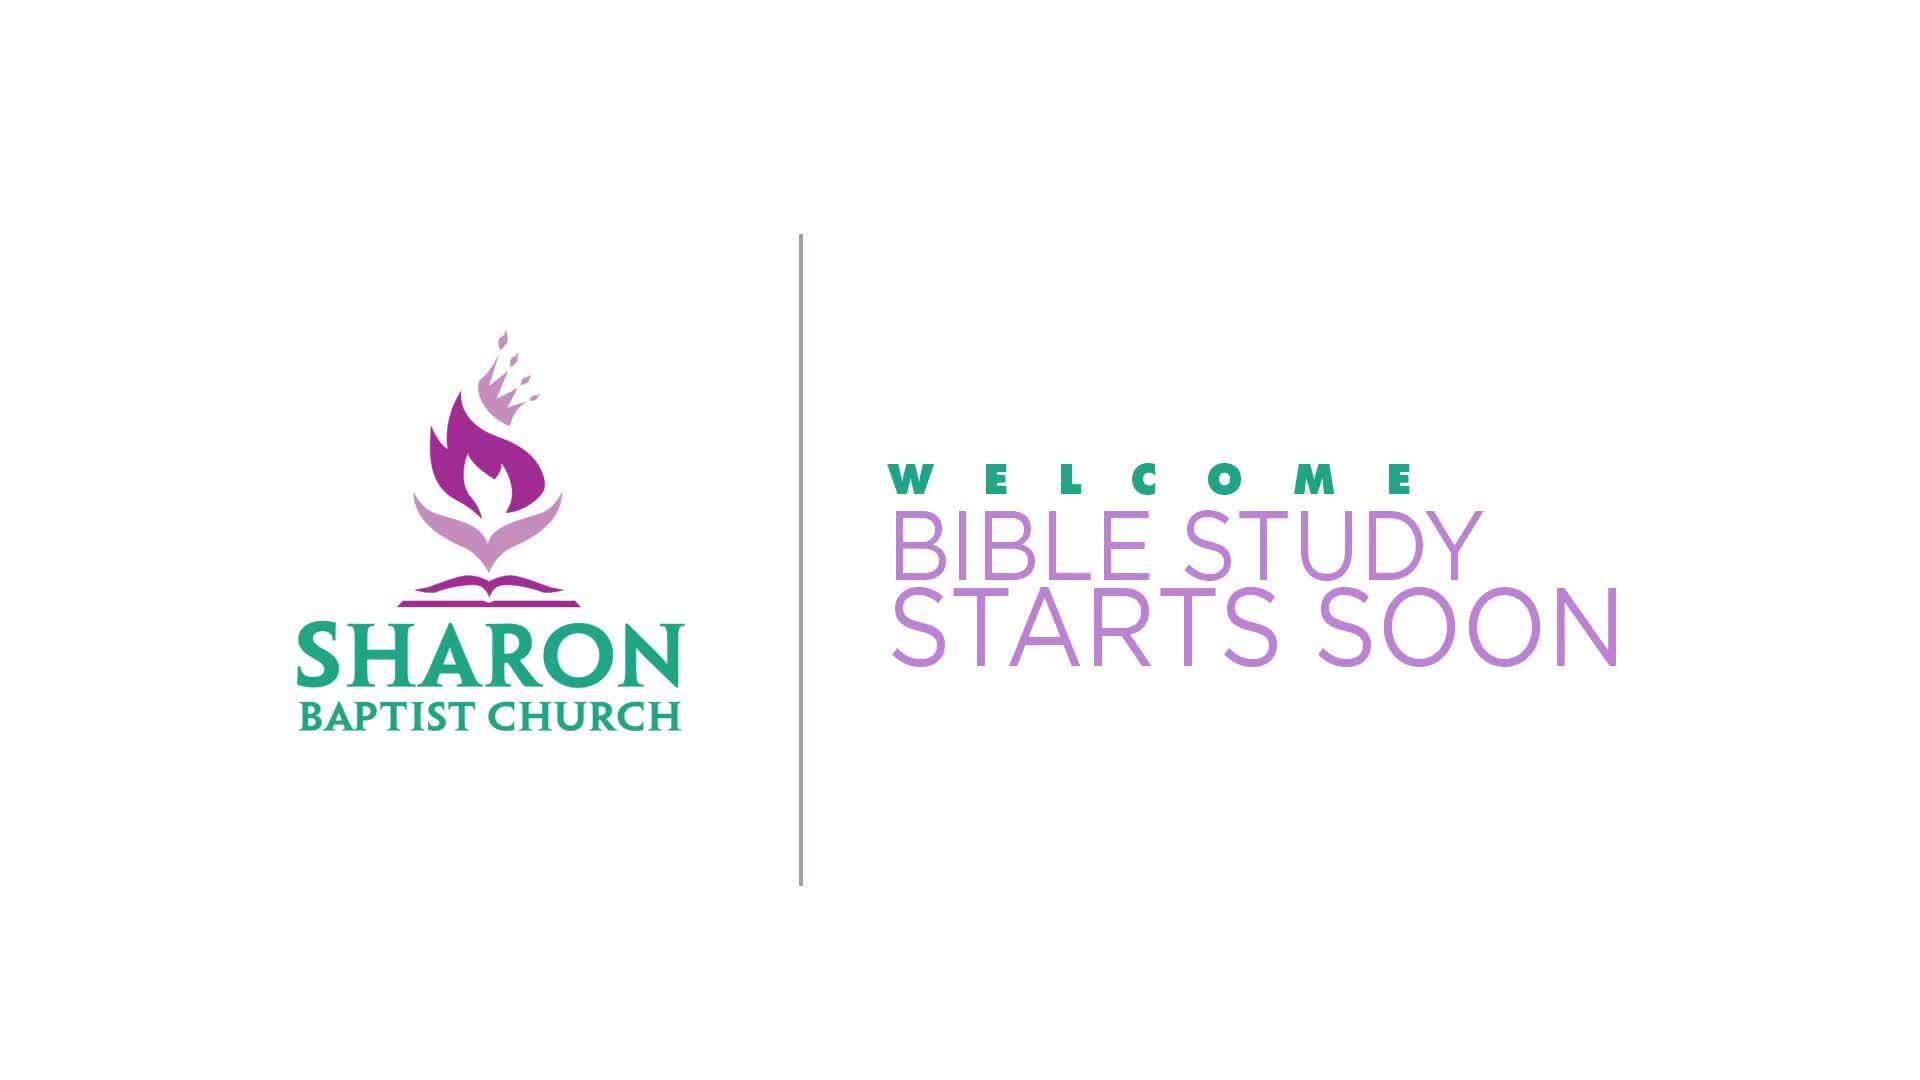 Sharon Baptist Church Philly on 22-Dec-20-23:46:14